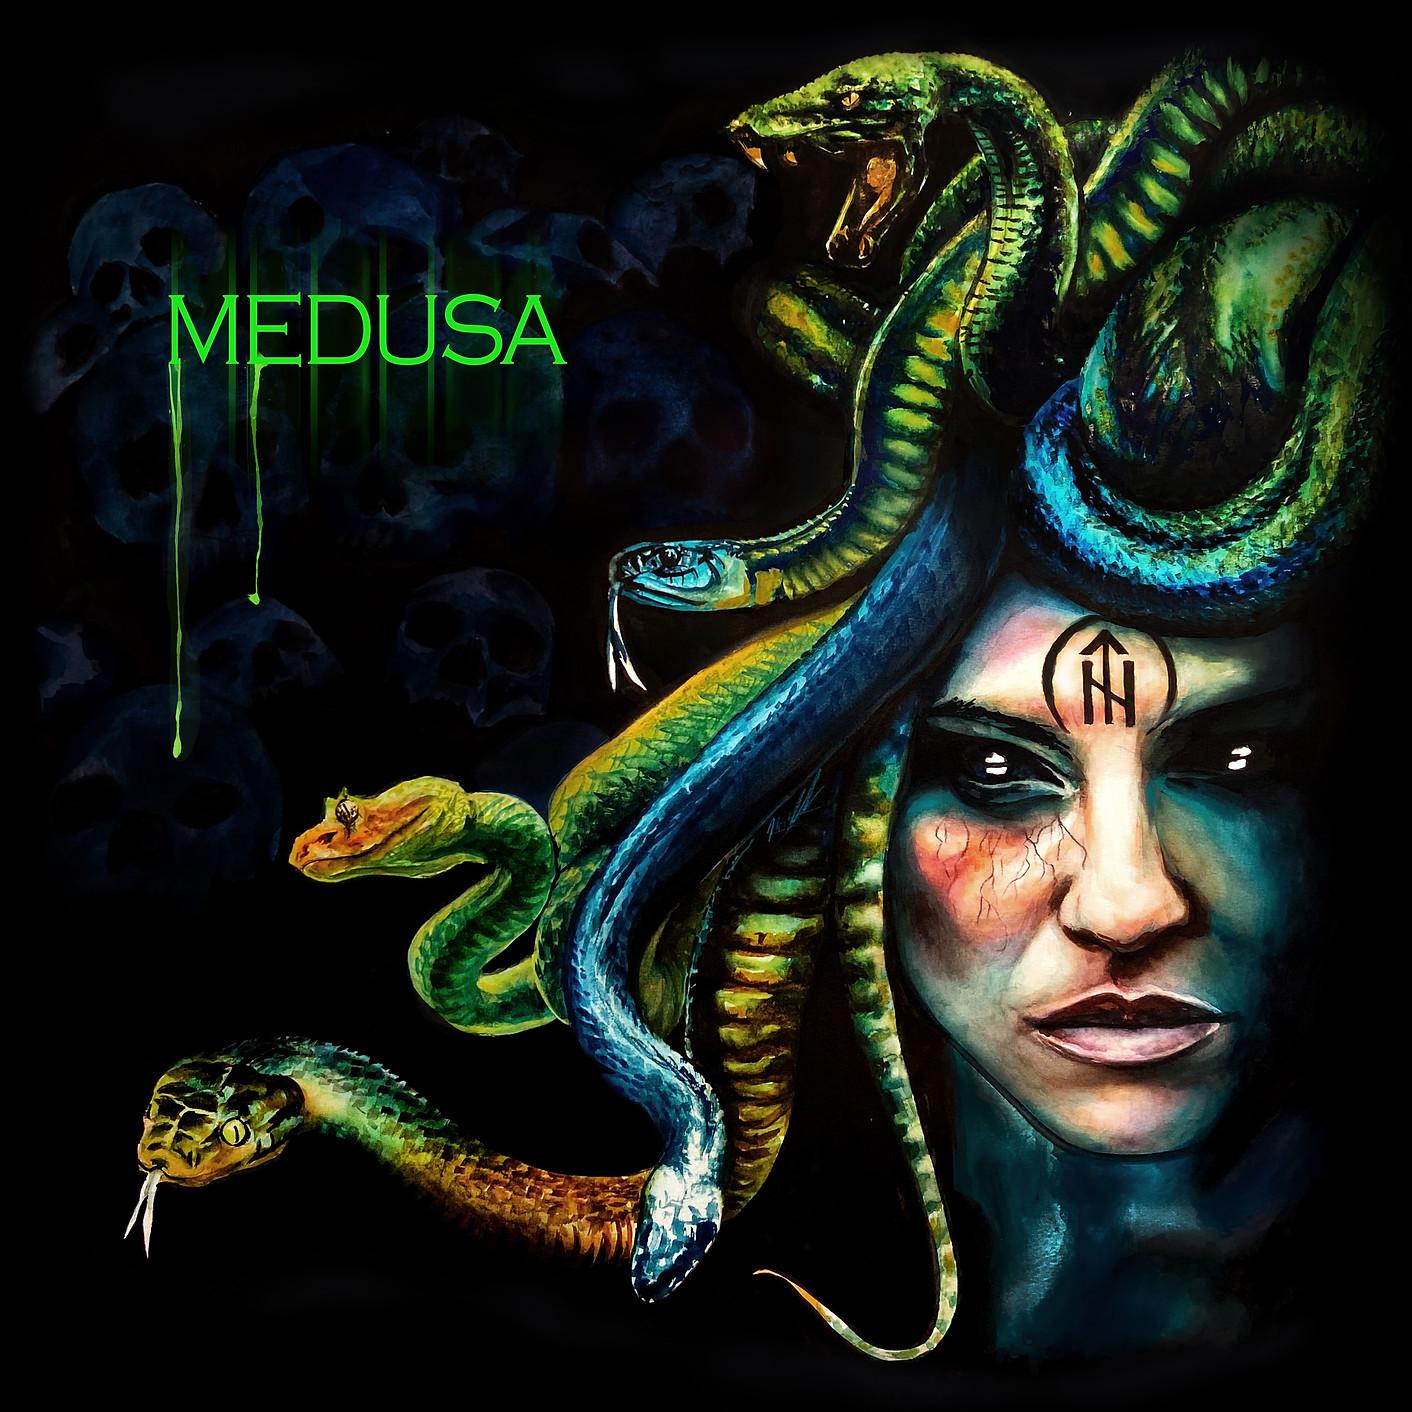 Medusa Single Artwork by Naomi Griffin